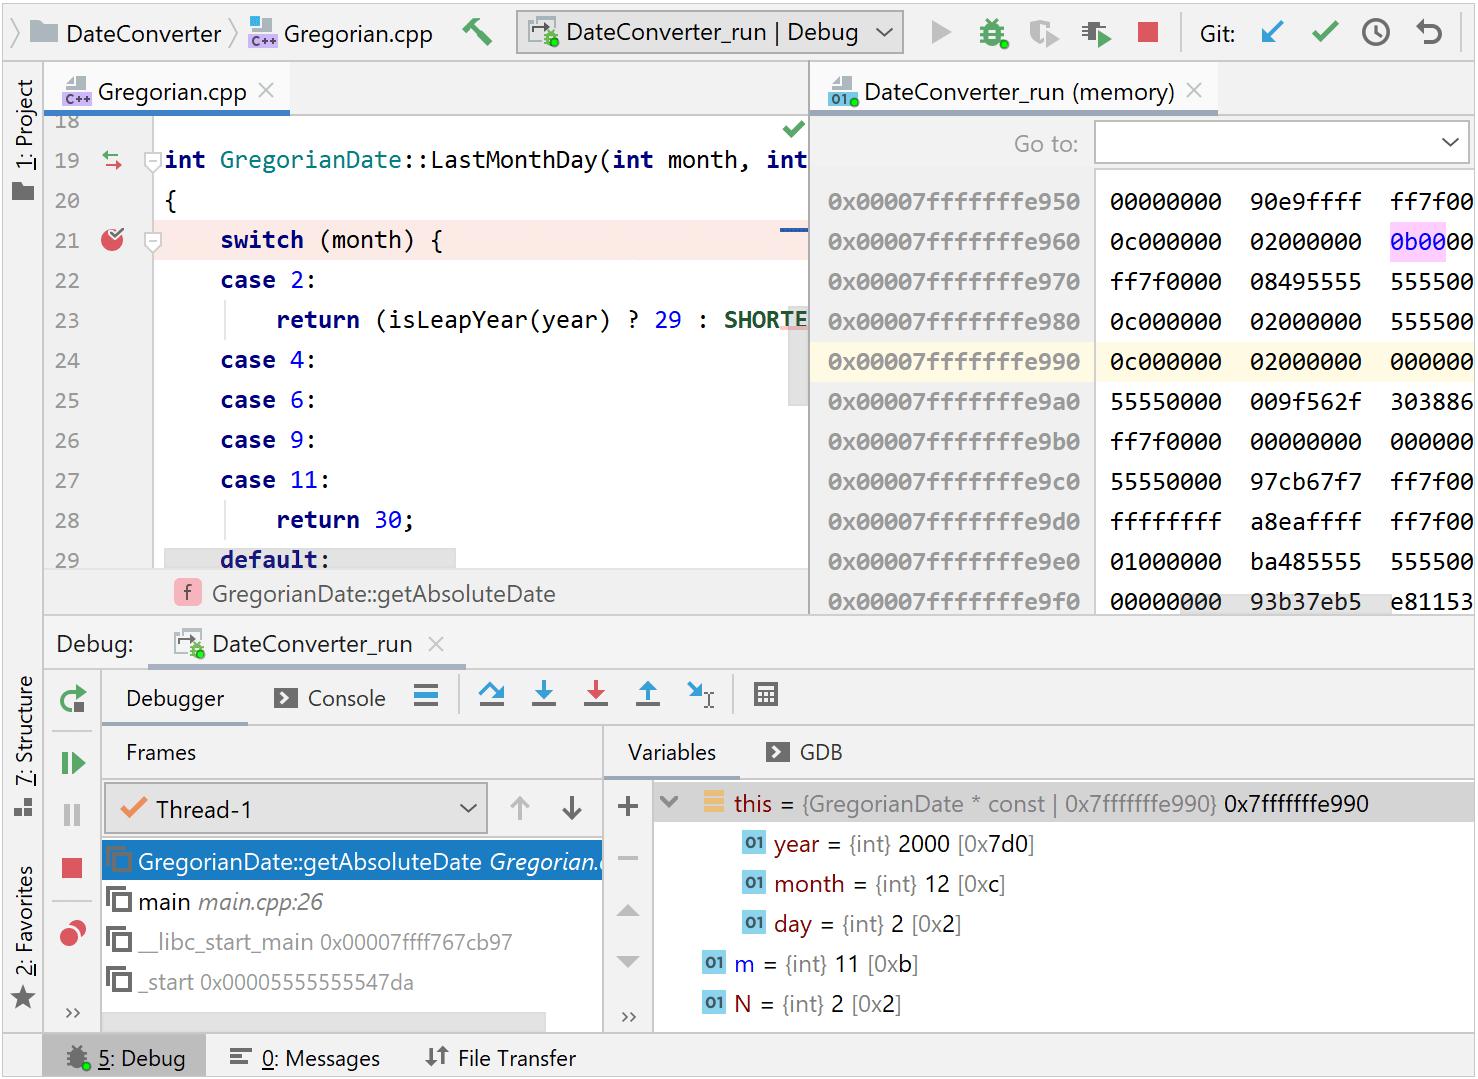 debugging with remote GDB server